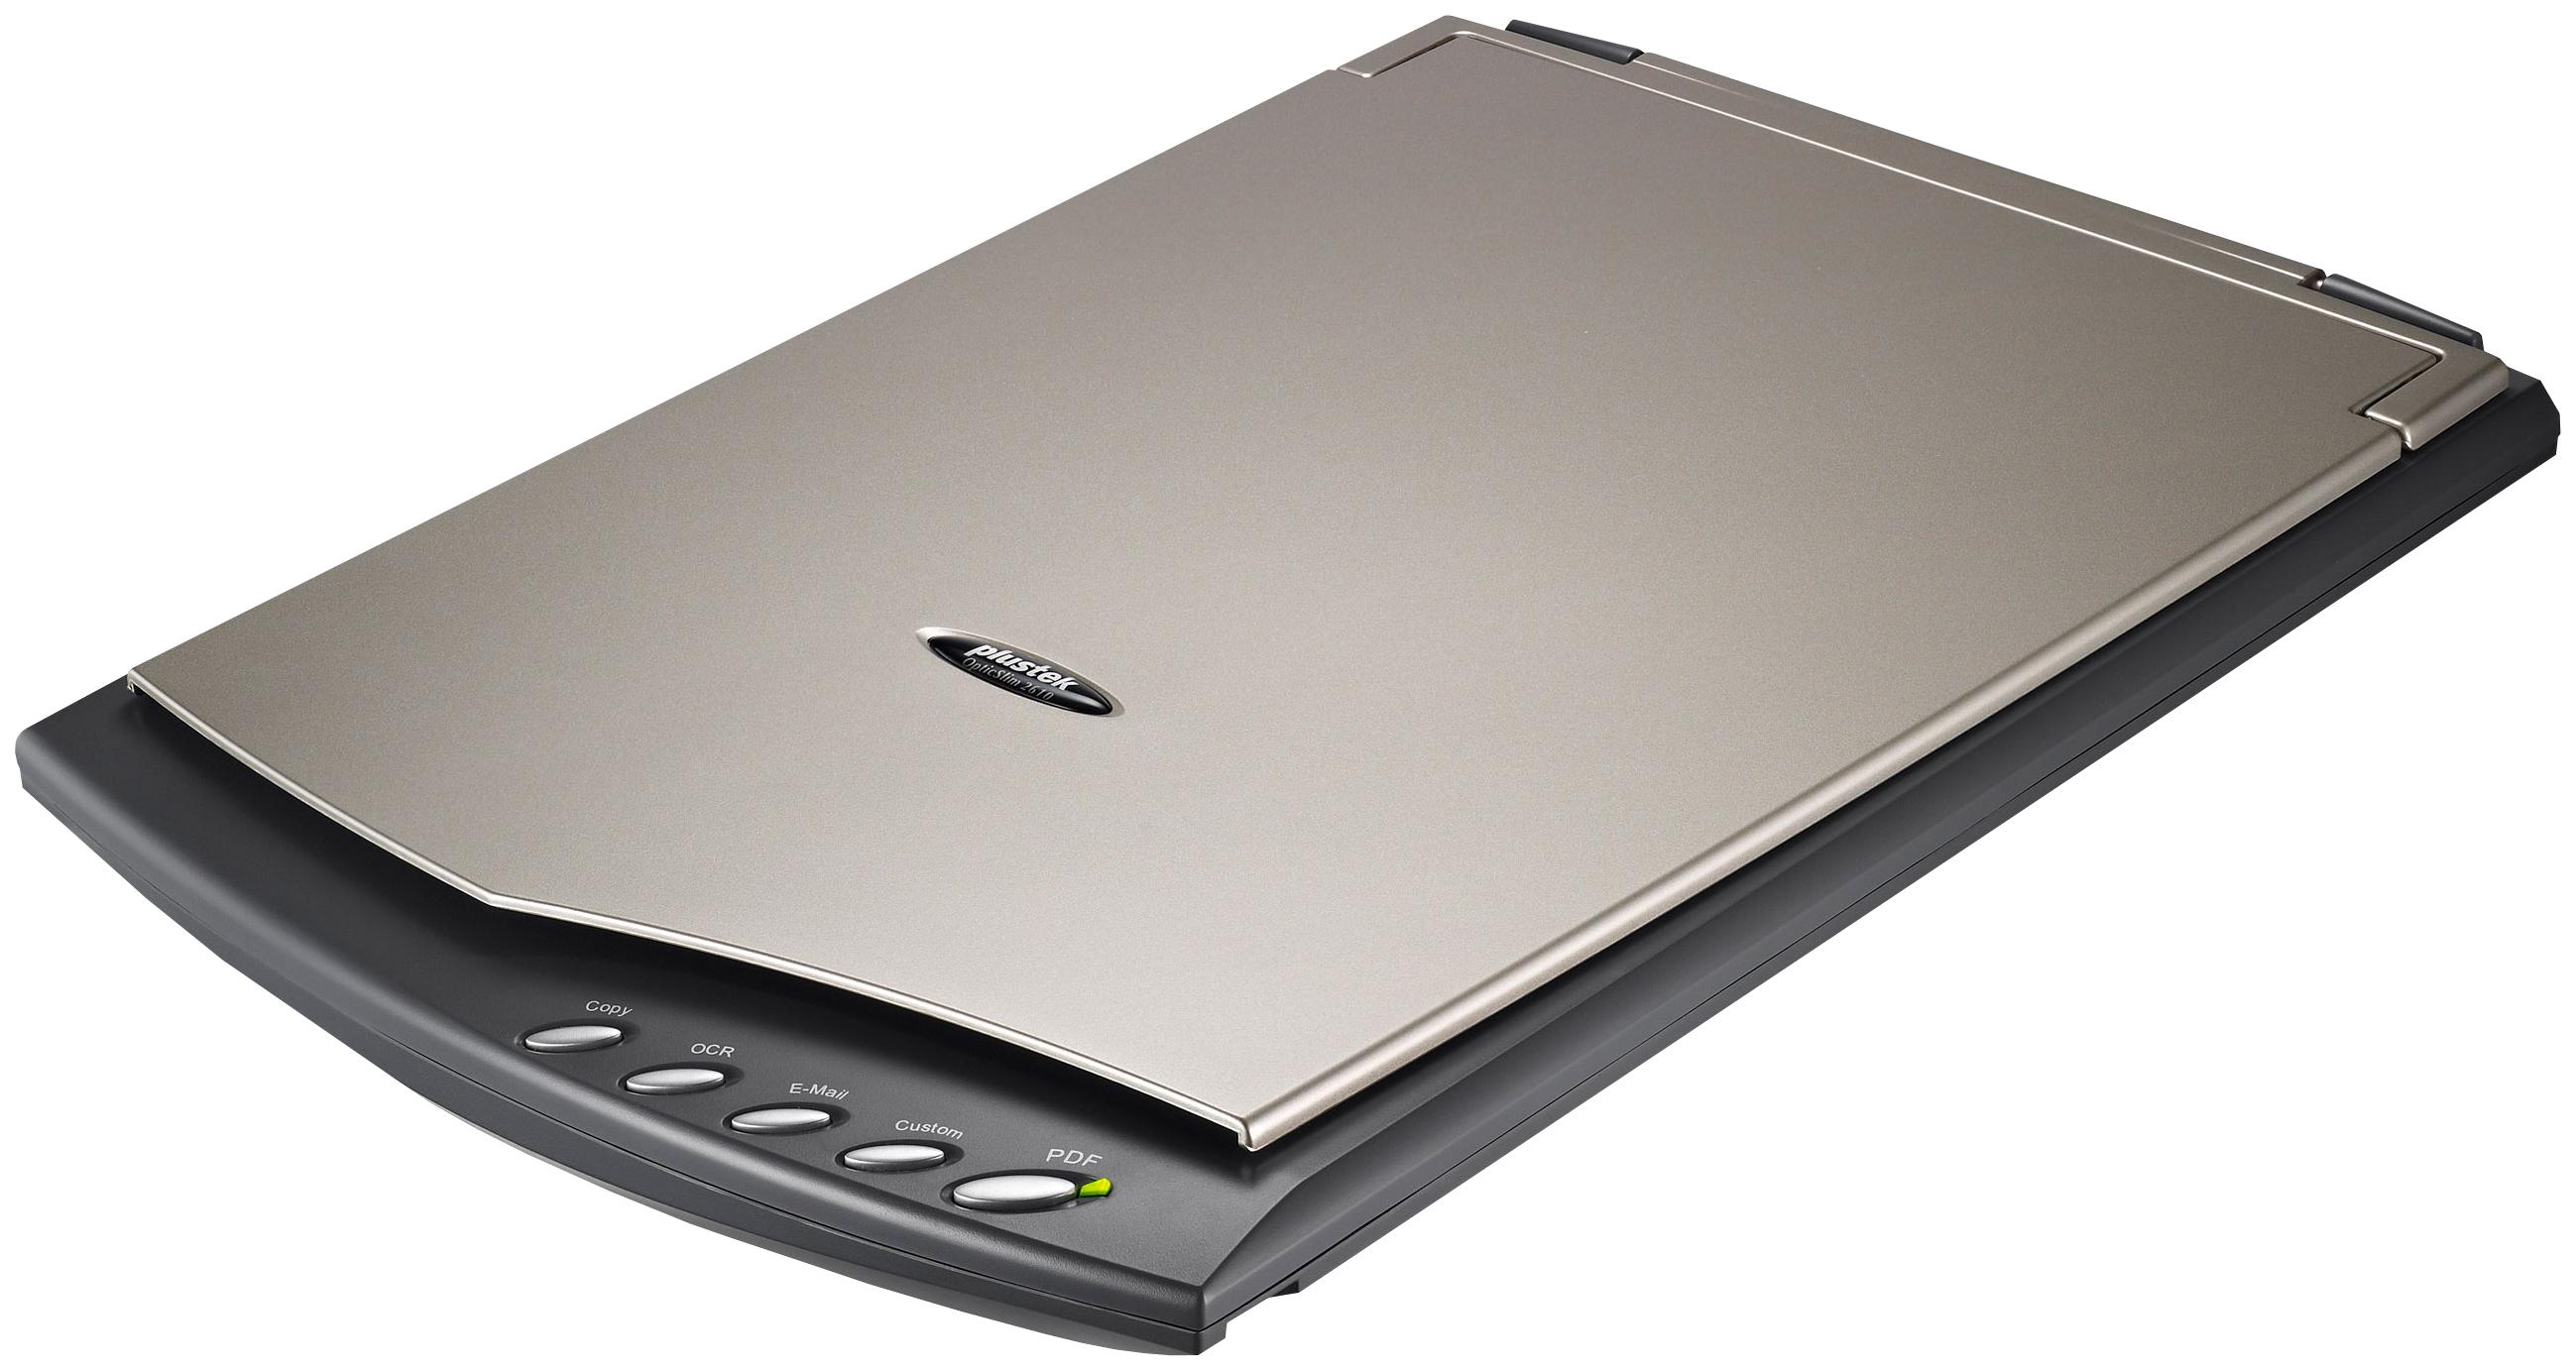 Cканер Plustek OpticSlim 2610 Серый